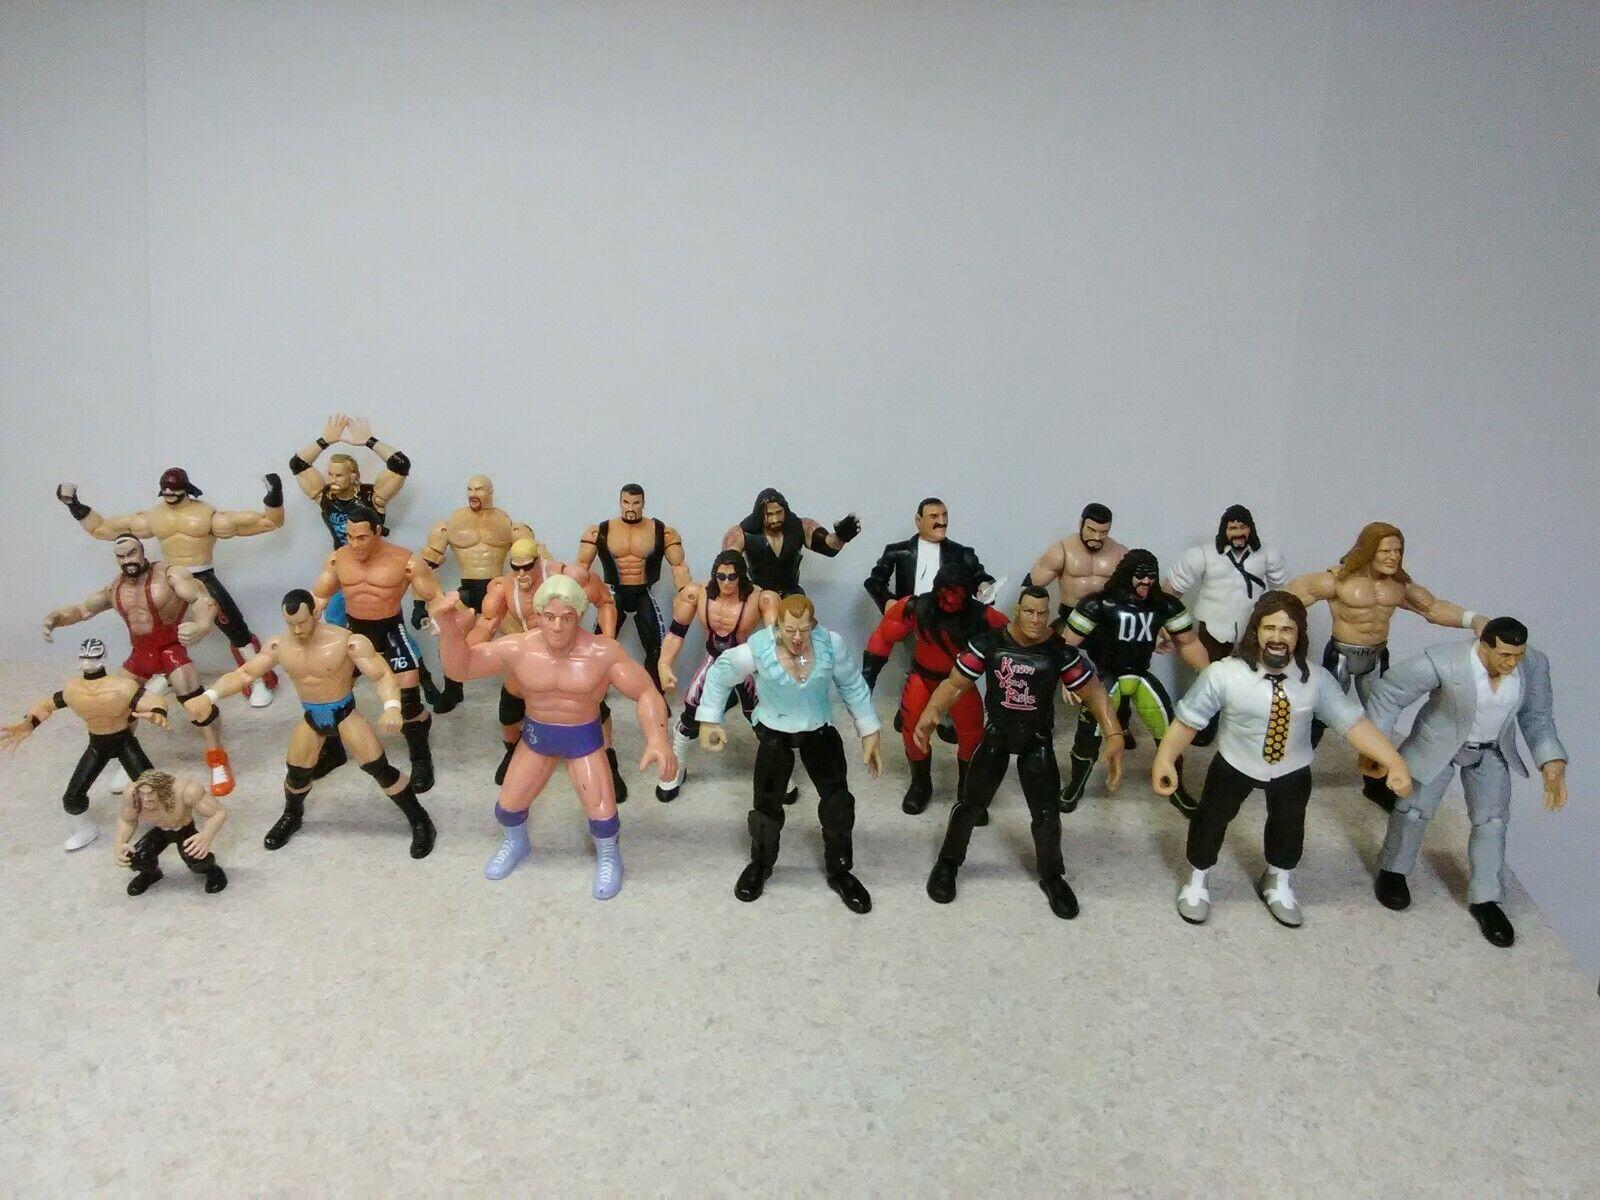 Lot Of 22 Wrestling azione cifras 1998-1999 Jakks Pacific  Marvel   giocattolo Biz